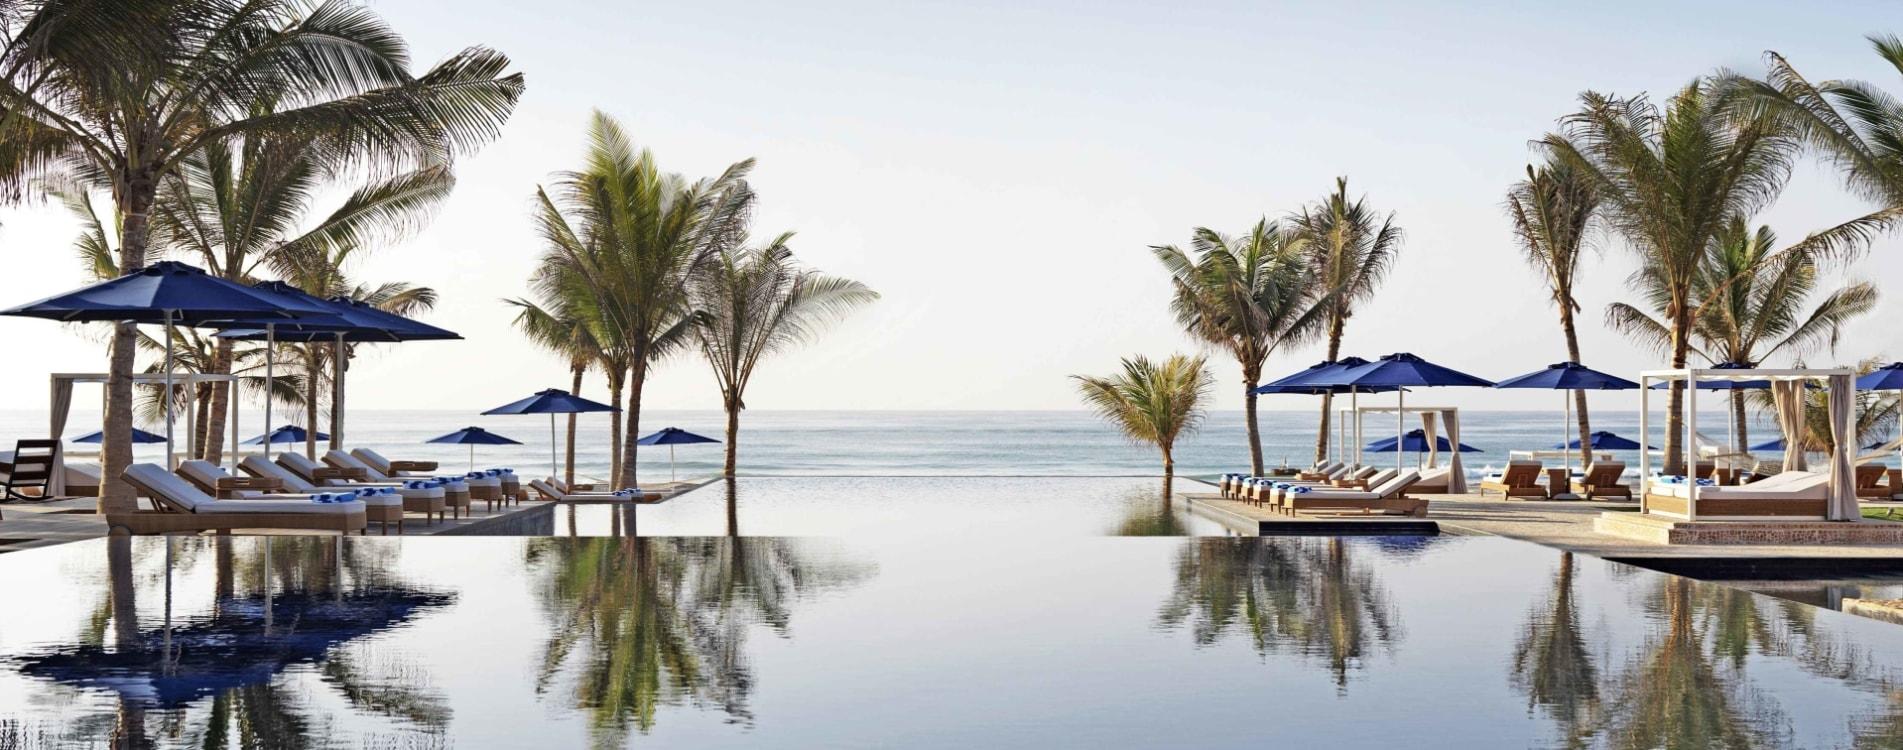 Al-Baleed-Resort-Salalah-By-Anantara-Infinity-Pool-Strandliegen-Oman.jpg